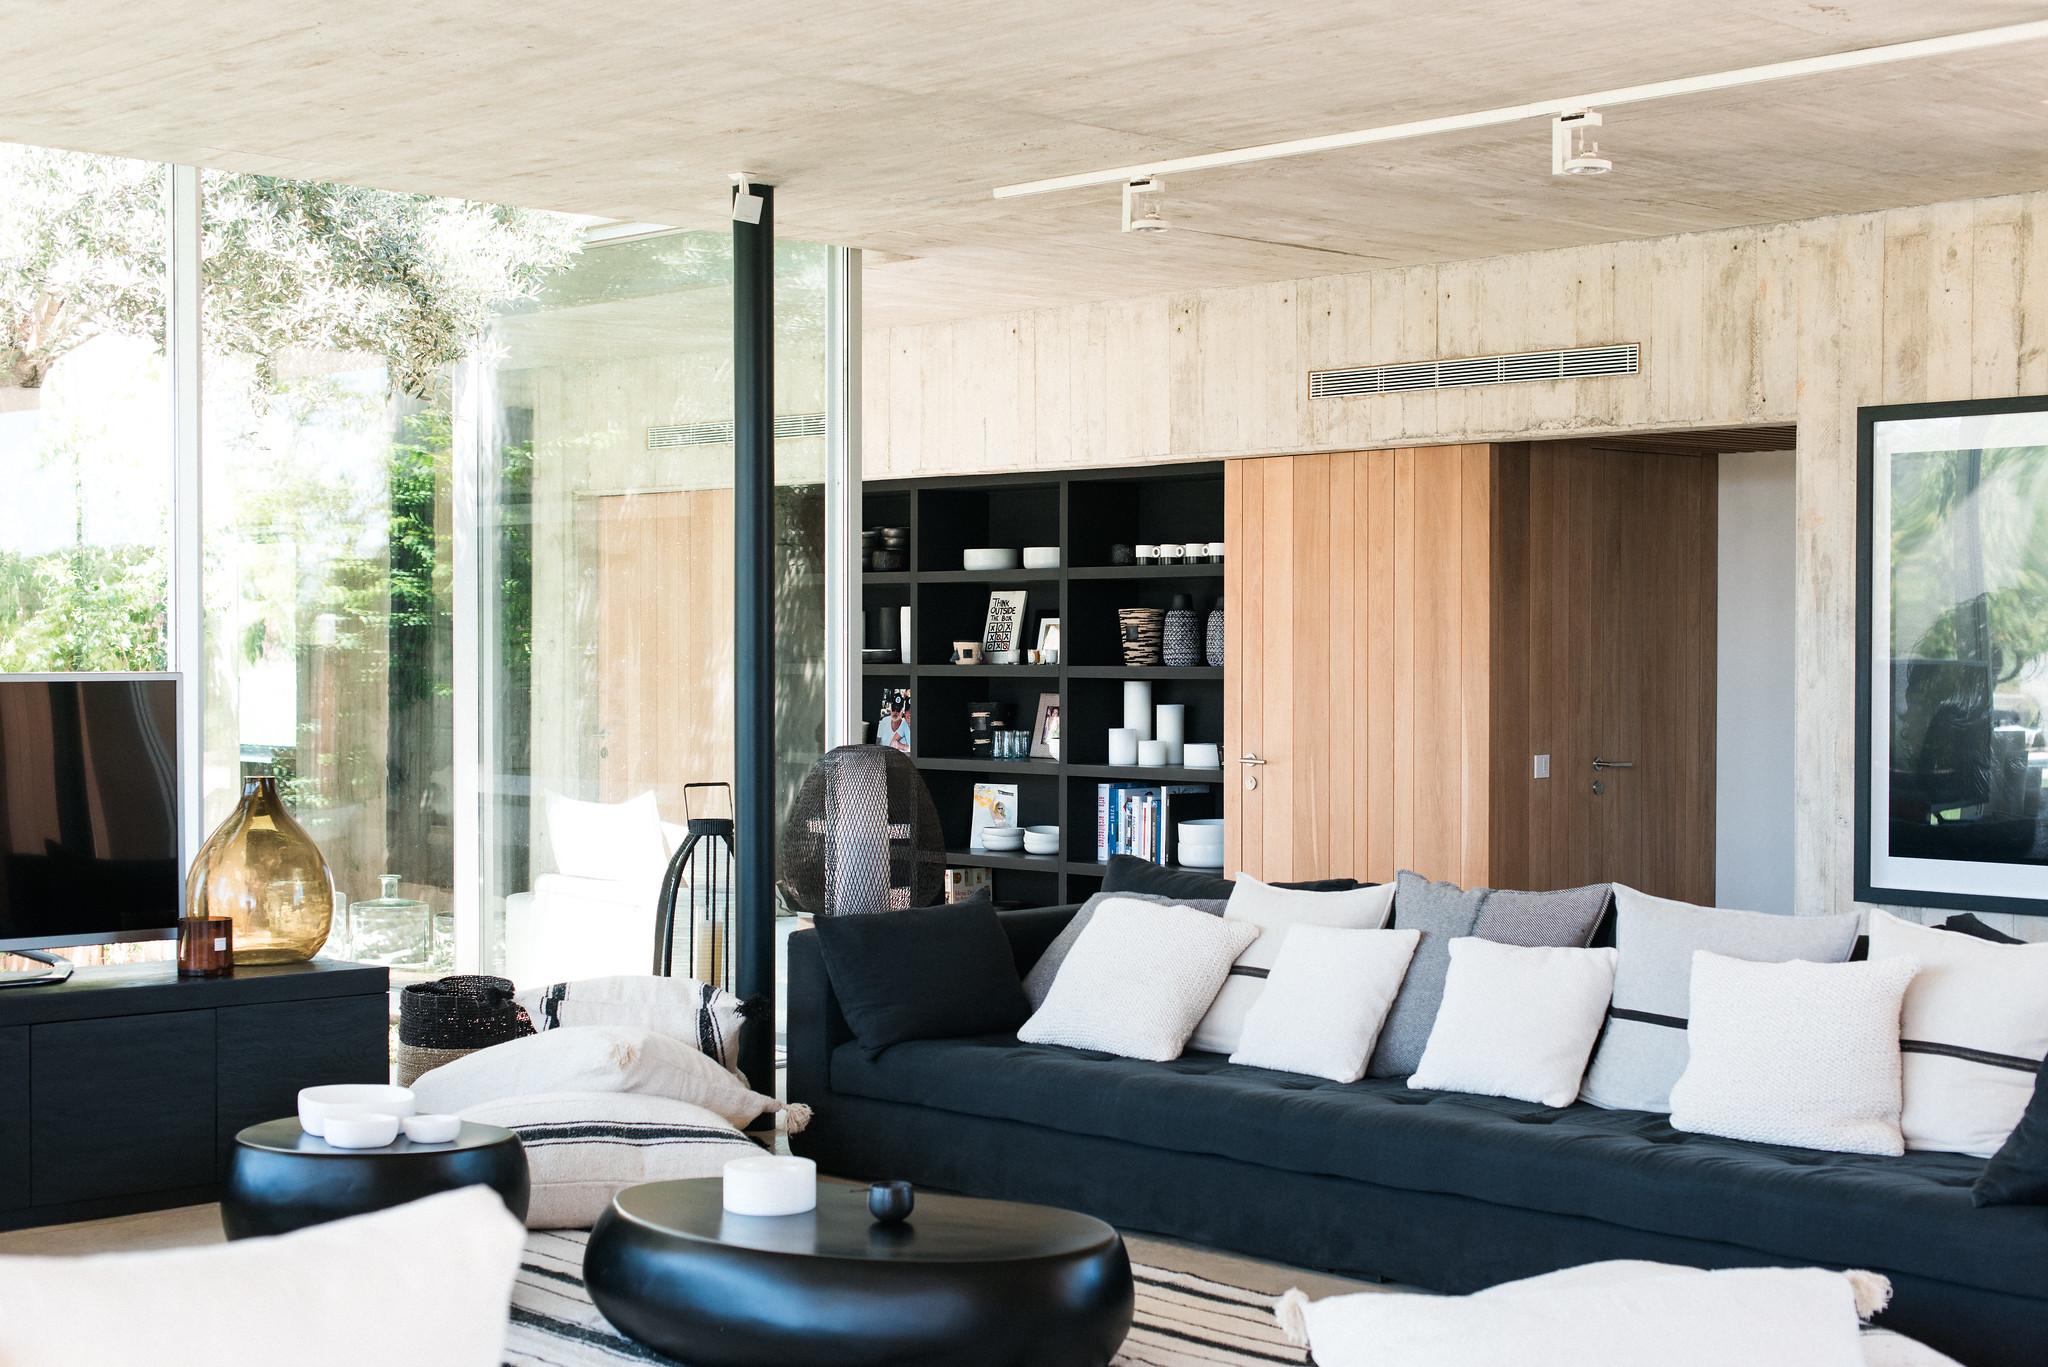 https://www.white-ibiza.com/wp-content/uploads/2020/06/white-ibiza-villas-casa-valentina-interior-living-room3.jpg